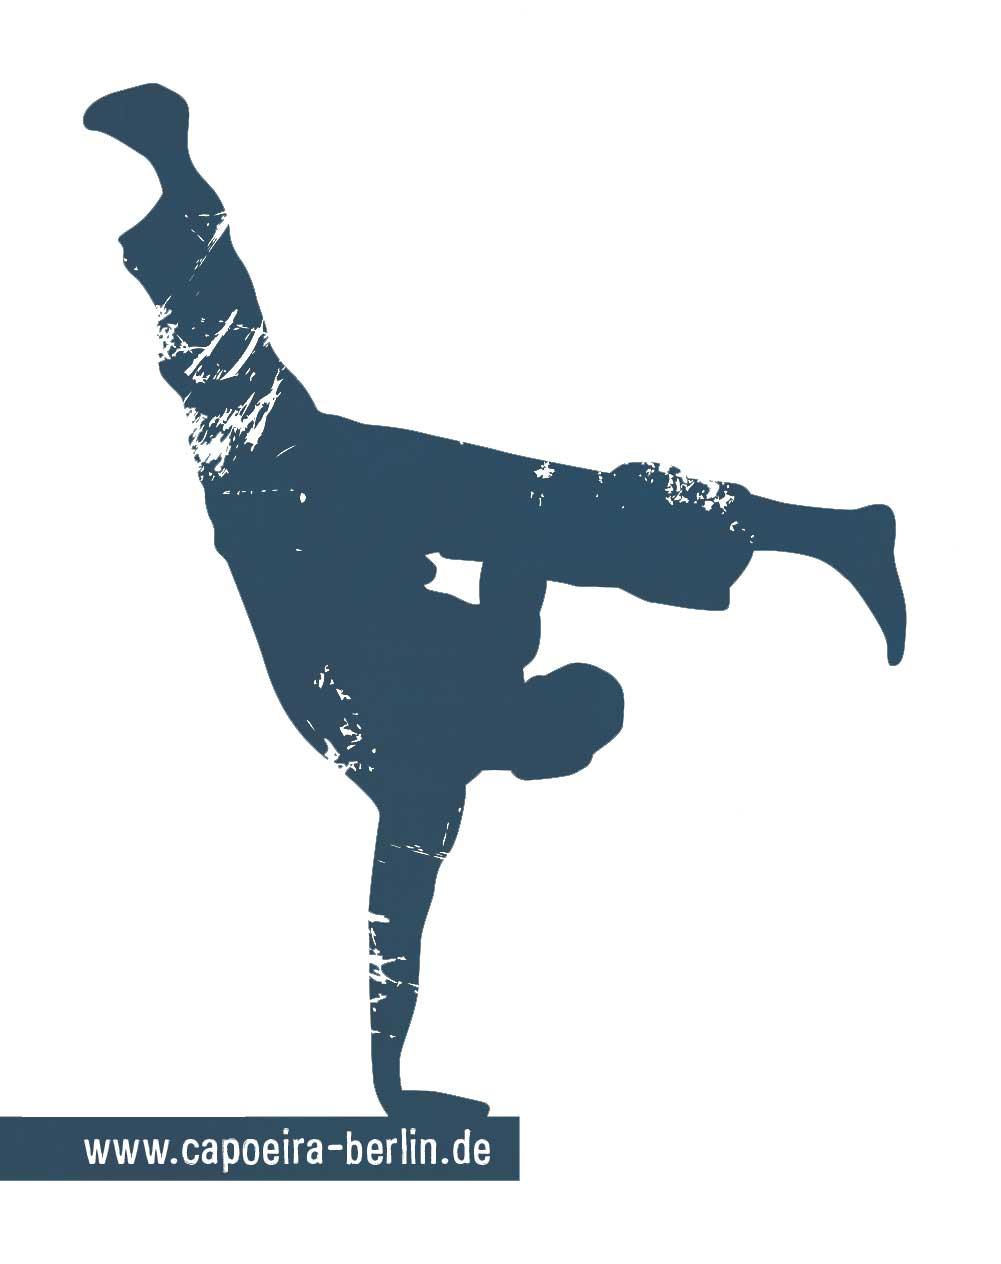 Capoeira Akademie Berlin: Solotänzer Silhouette